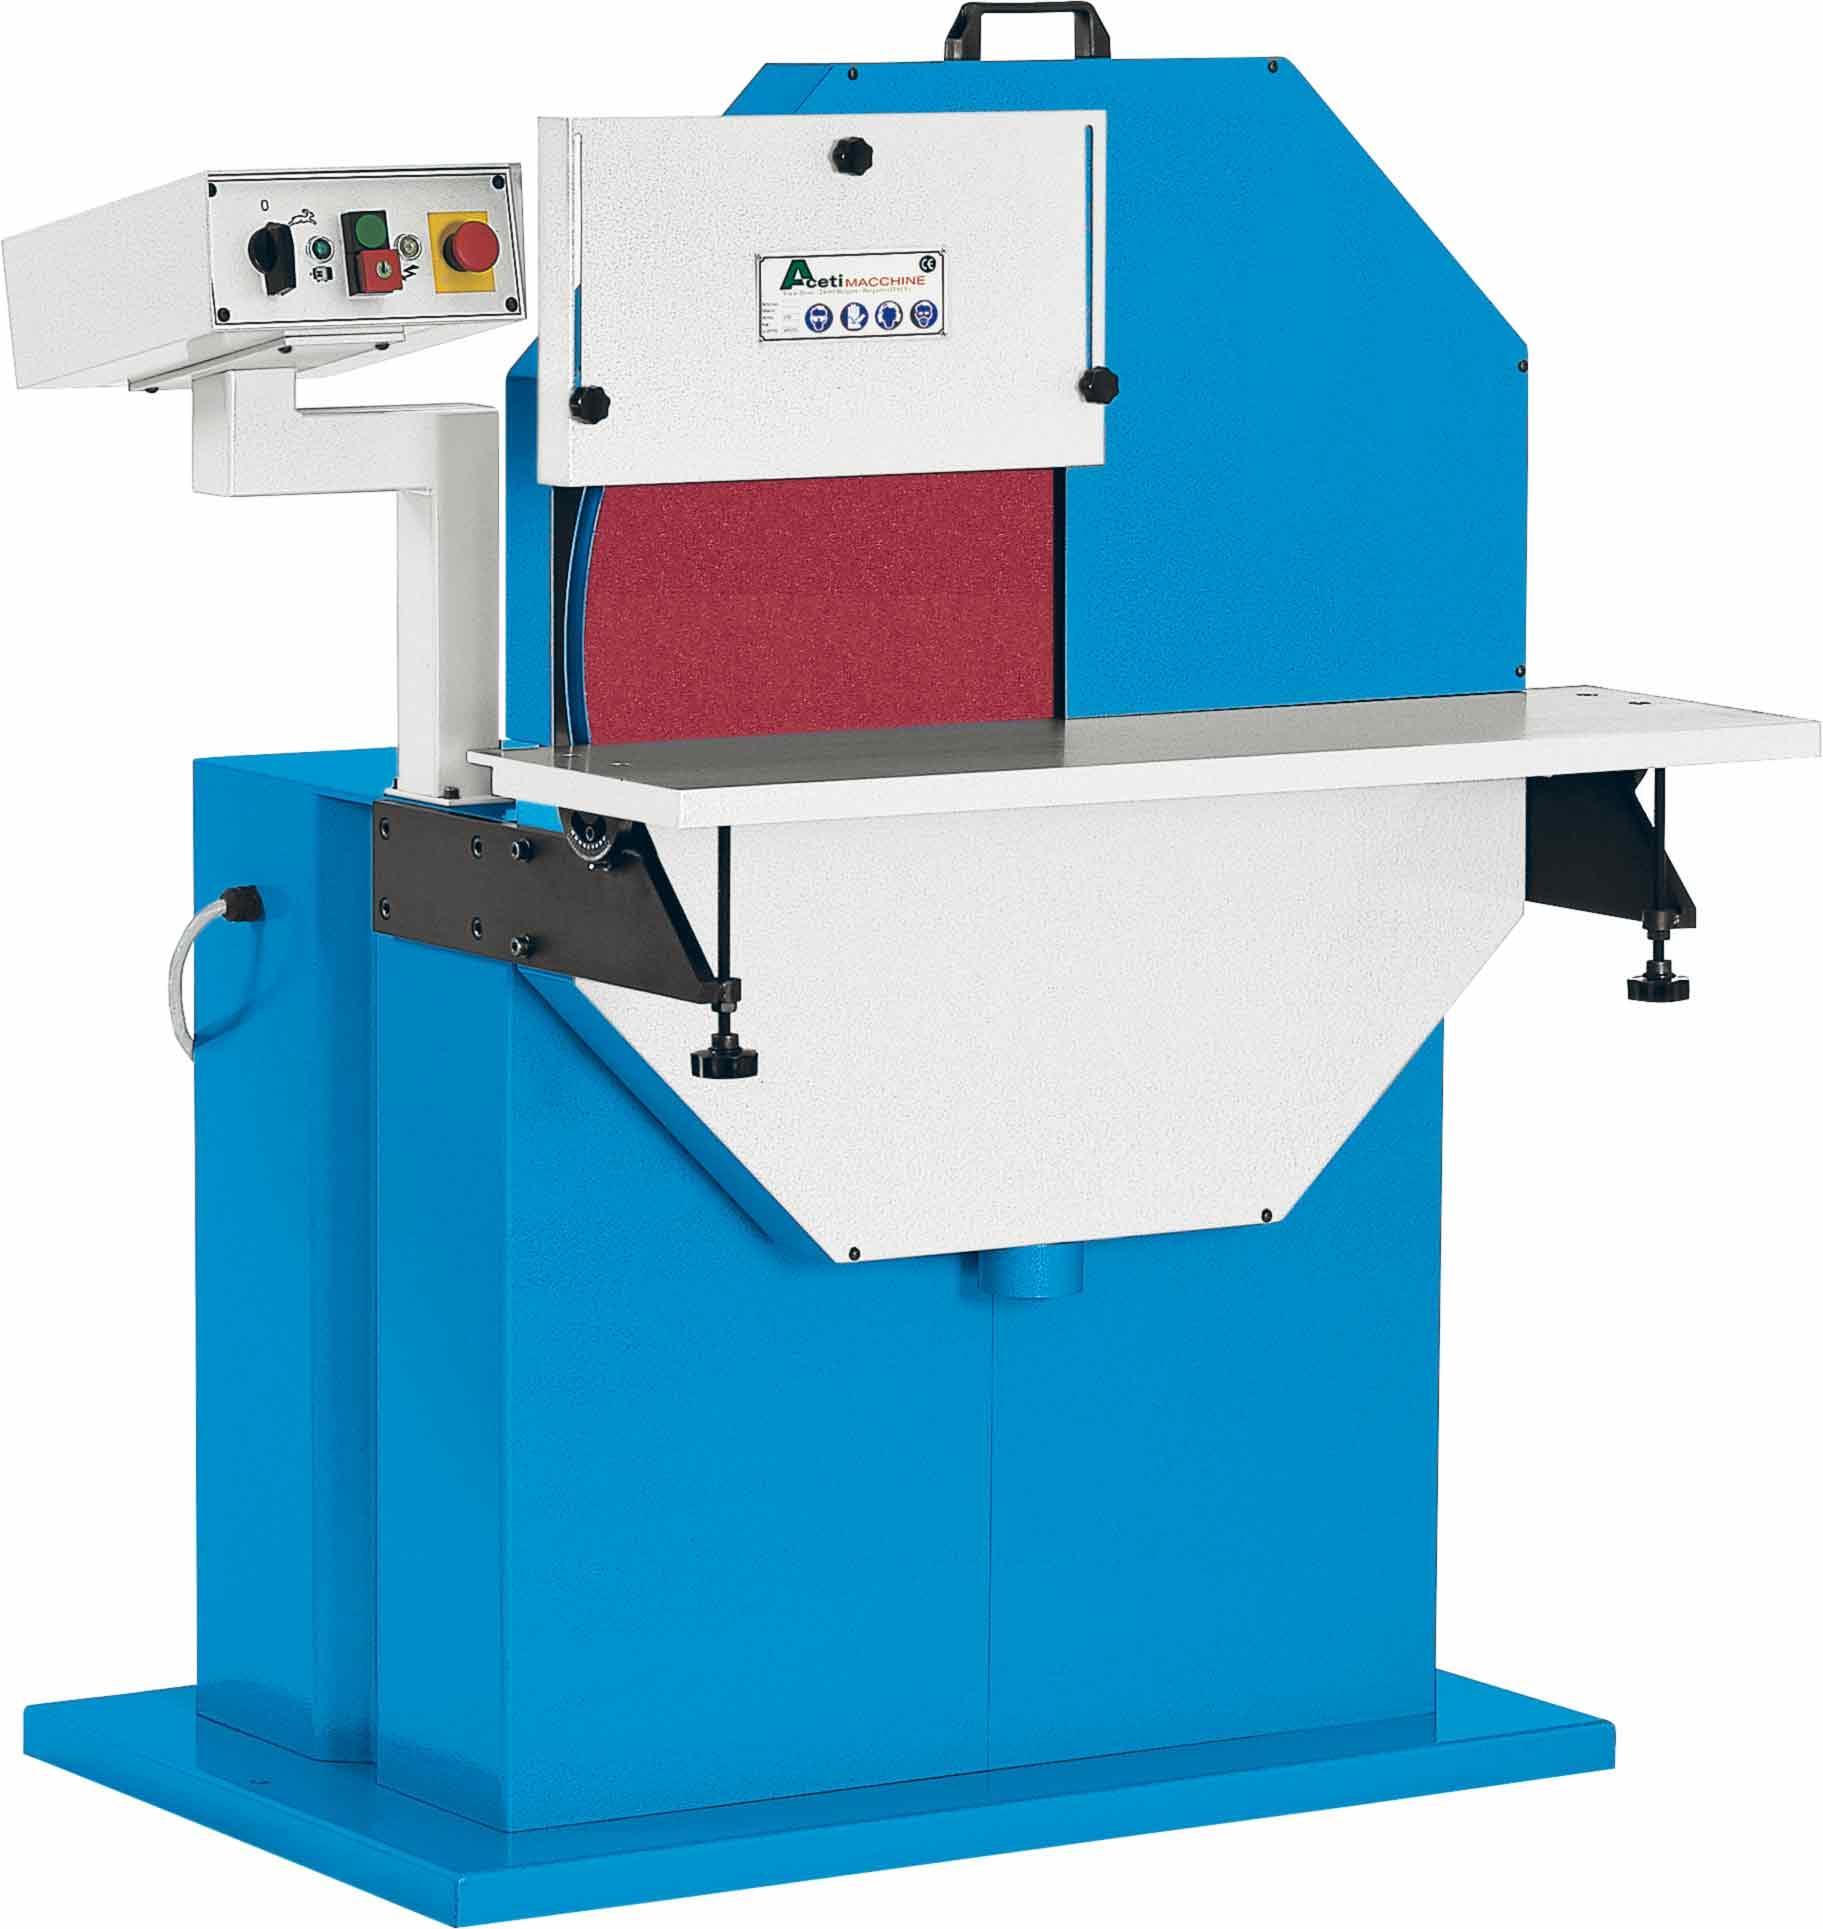 ART.52 - Disc grinding machine